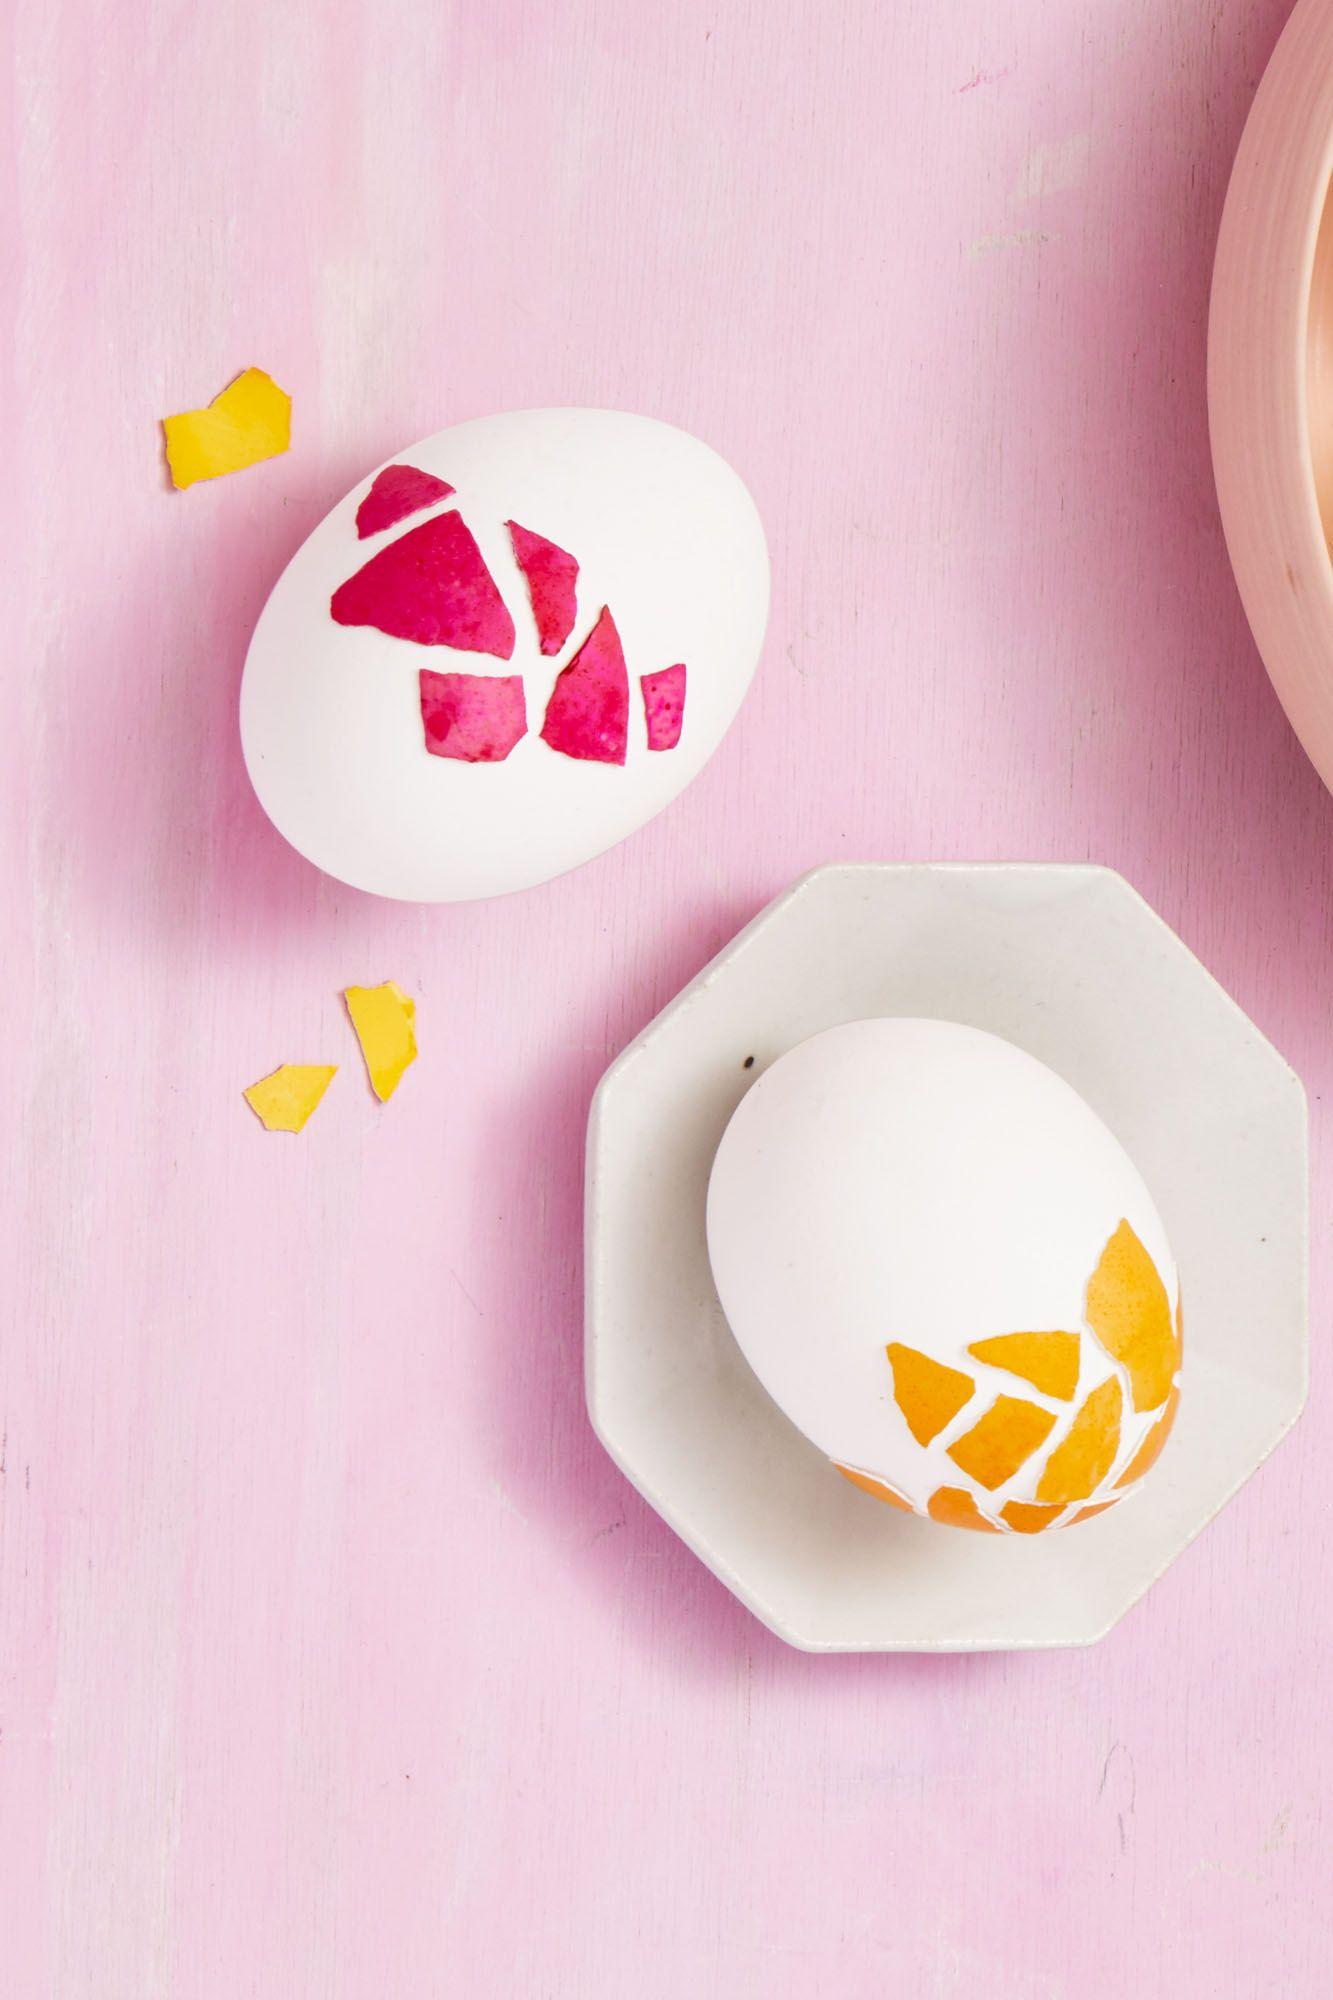 adc12741d 58 Best Easter Egg Designs - Easy DIY Ideas for Easter Egg Decorating